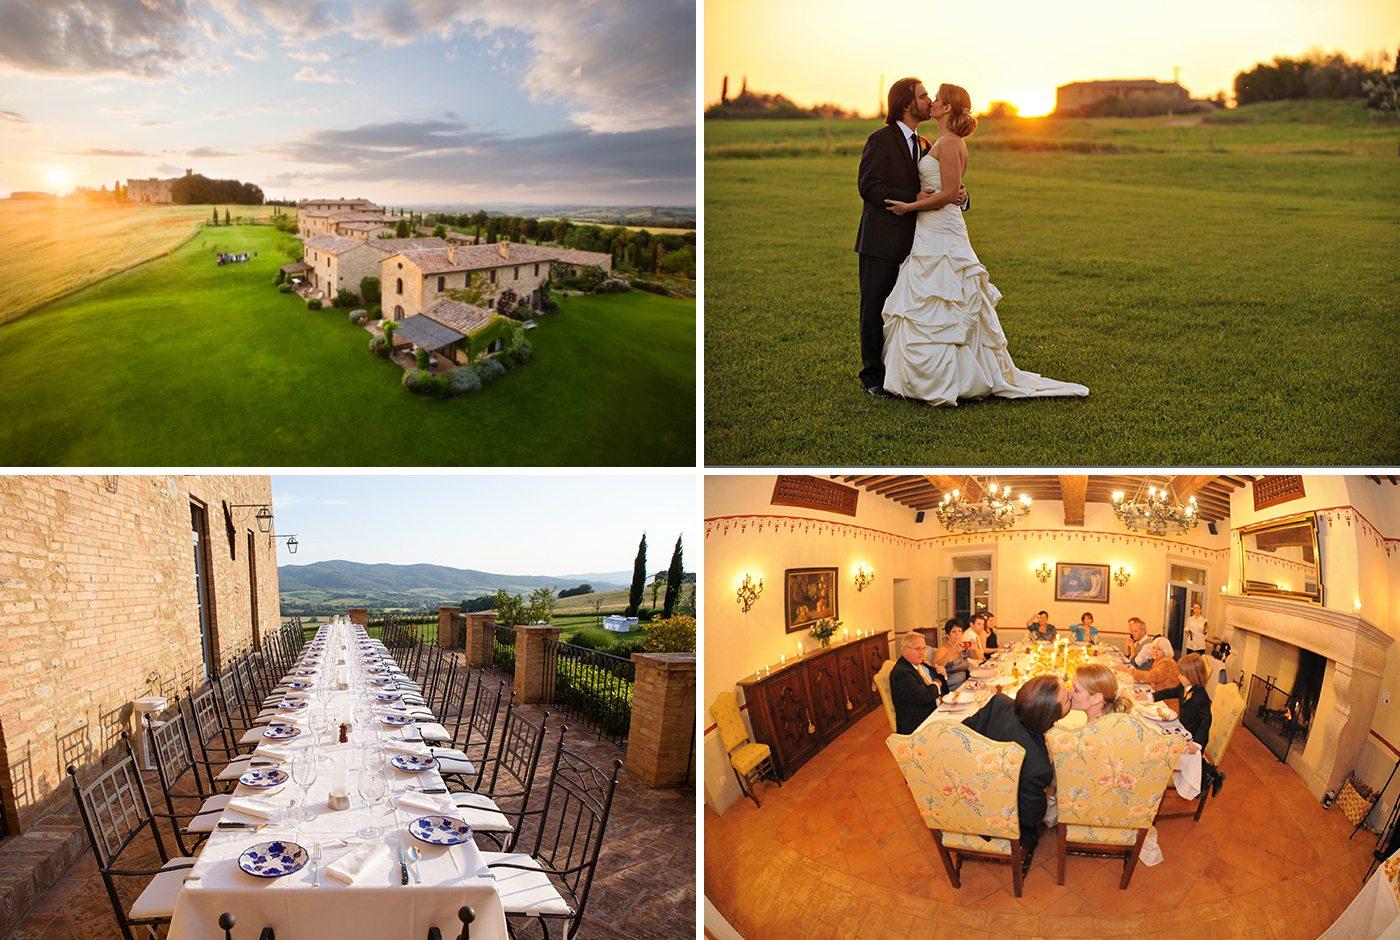 borgo weddings